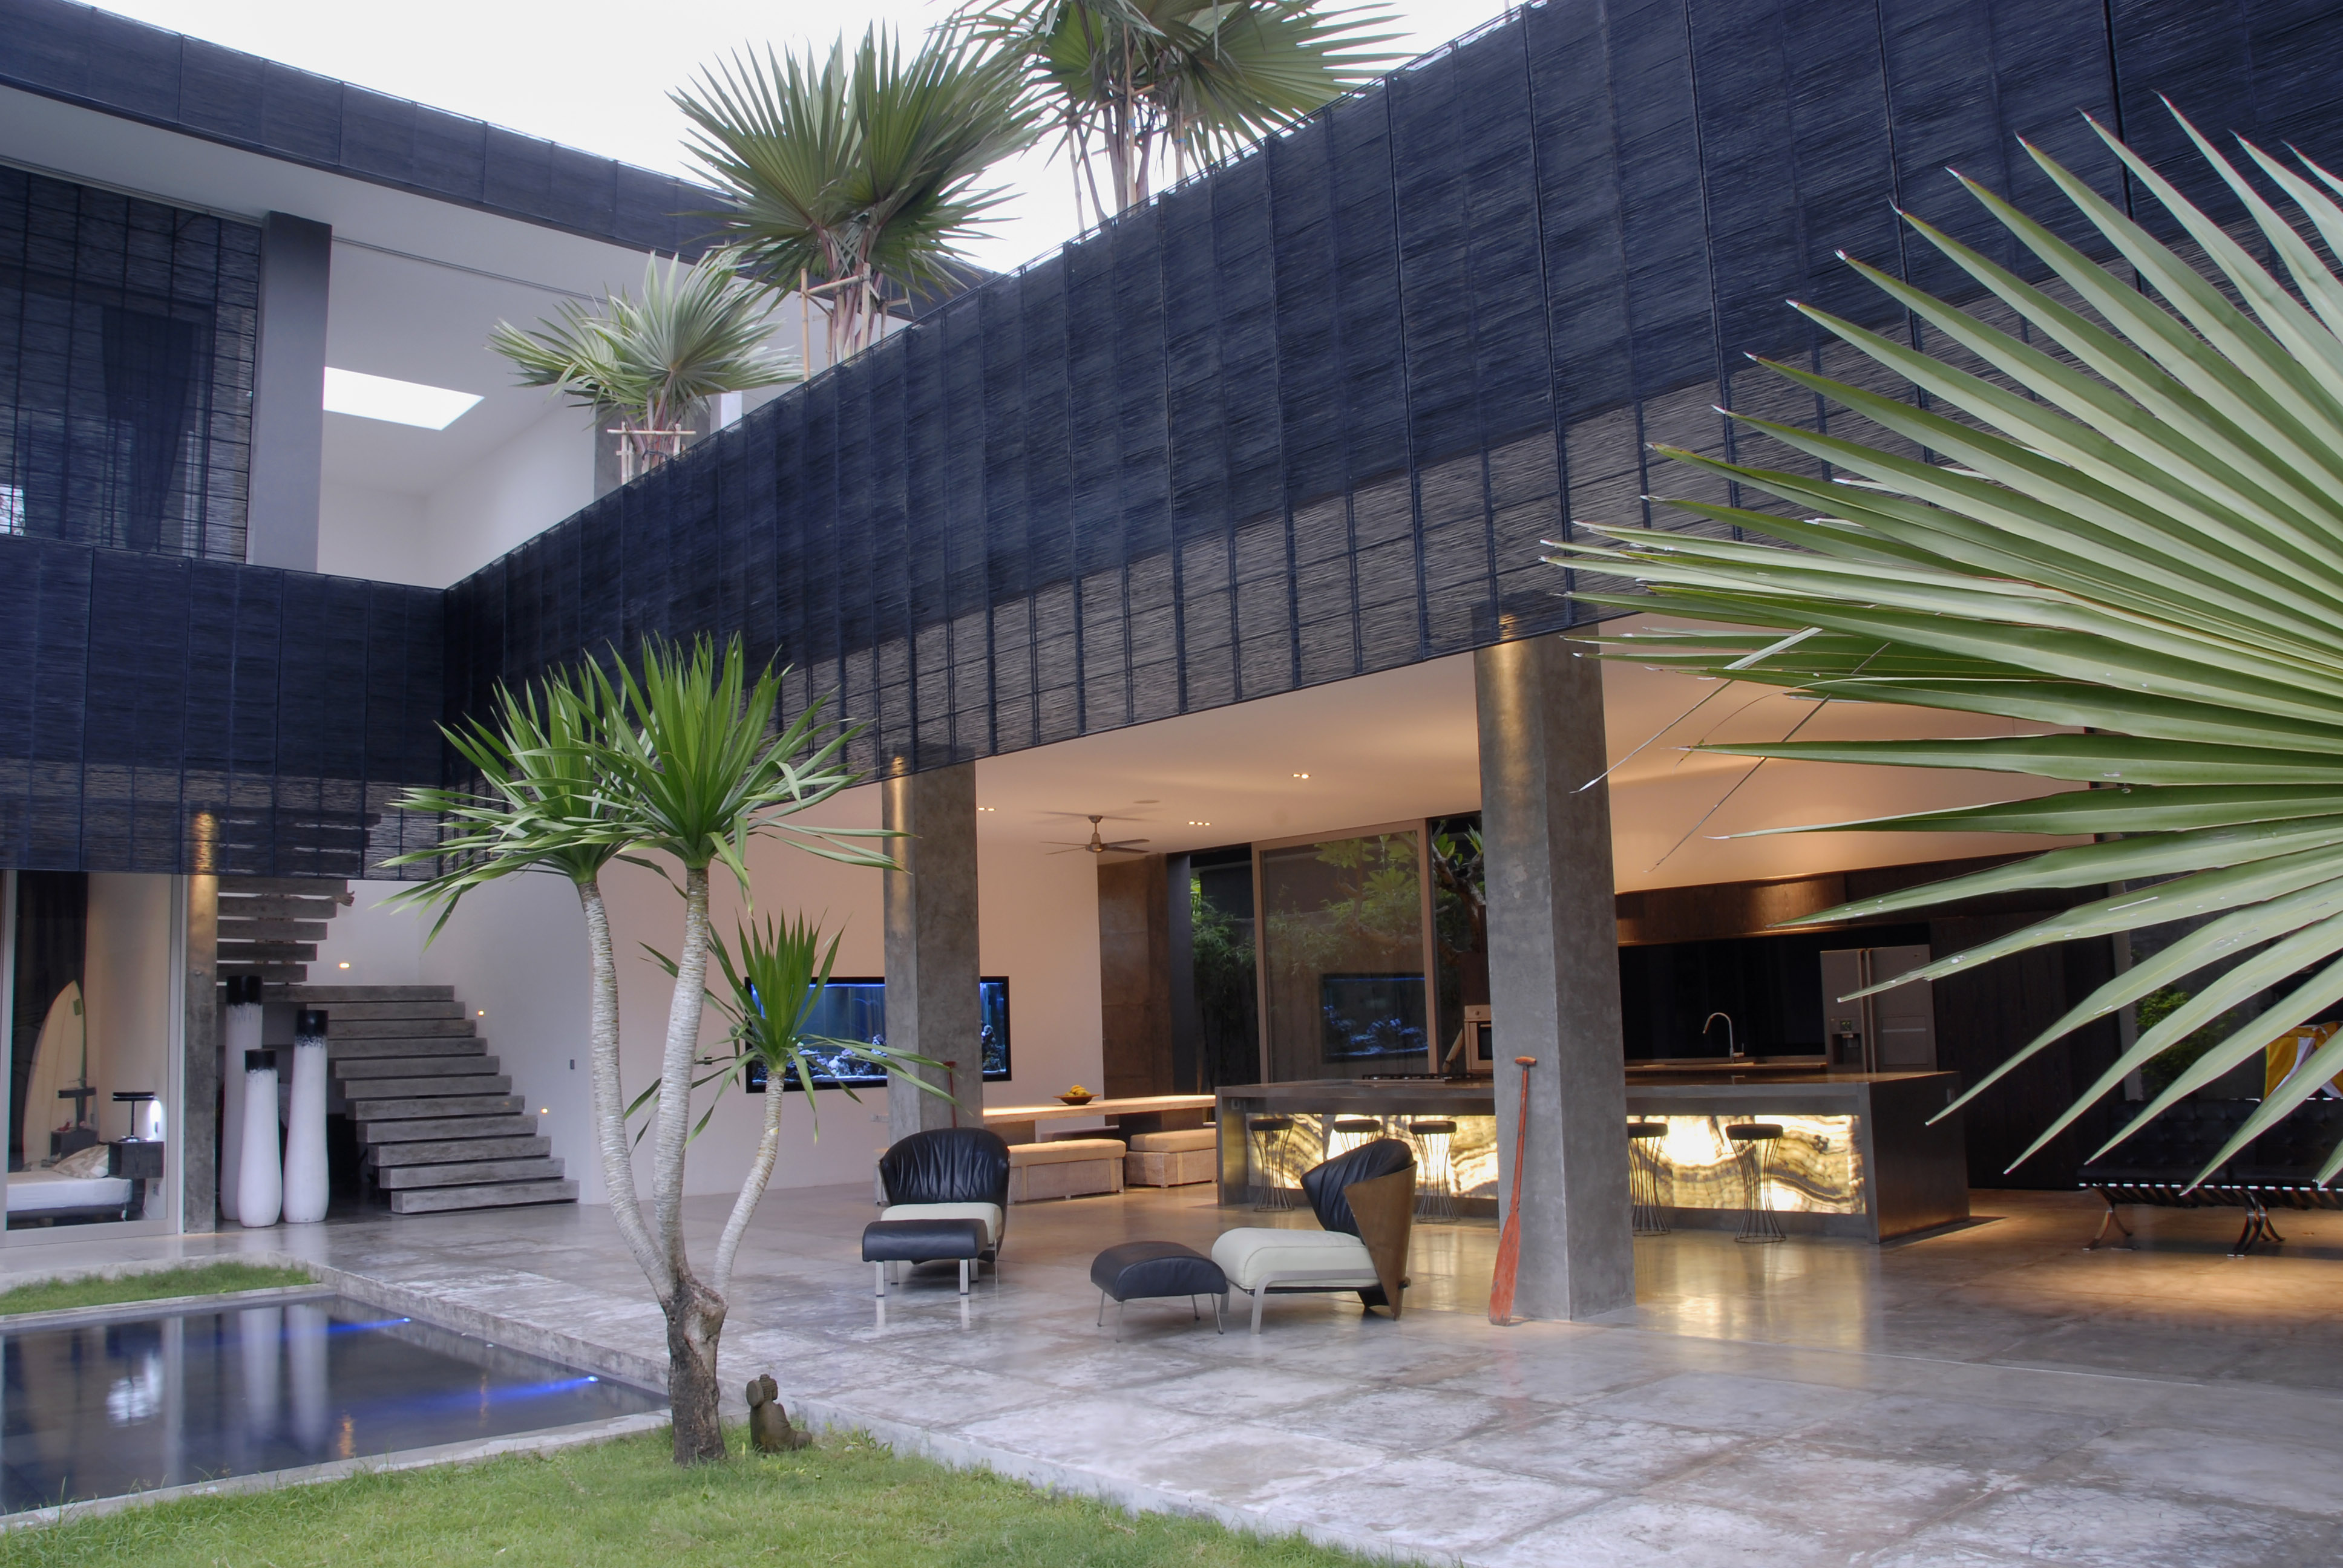 Modern 4bd Villa With Pool Villas For Rent In Kuta Bali Indonesia